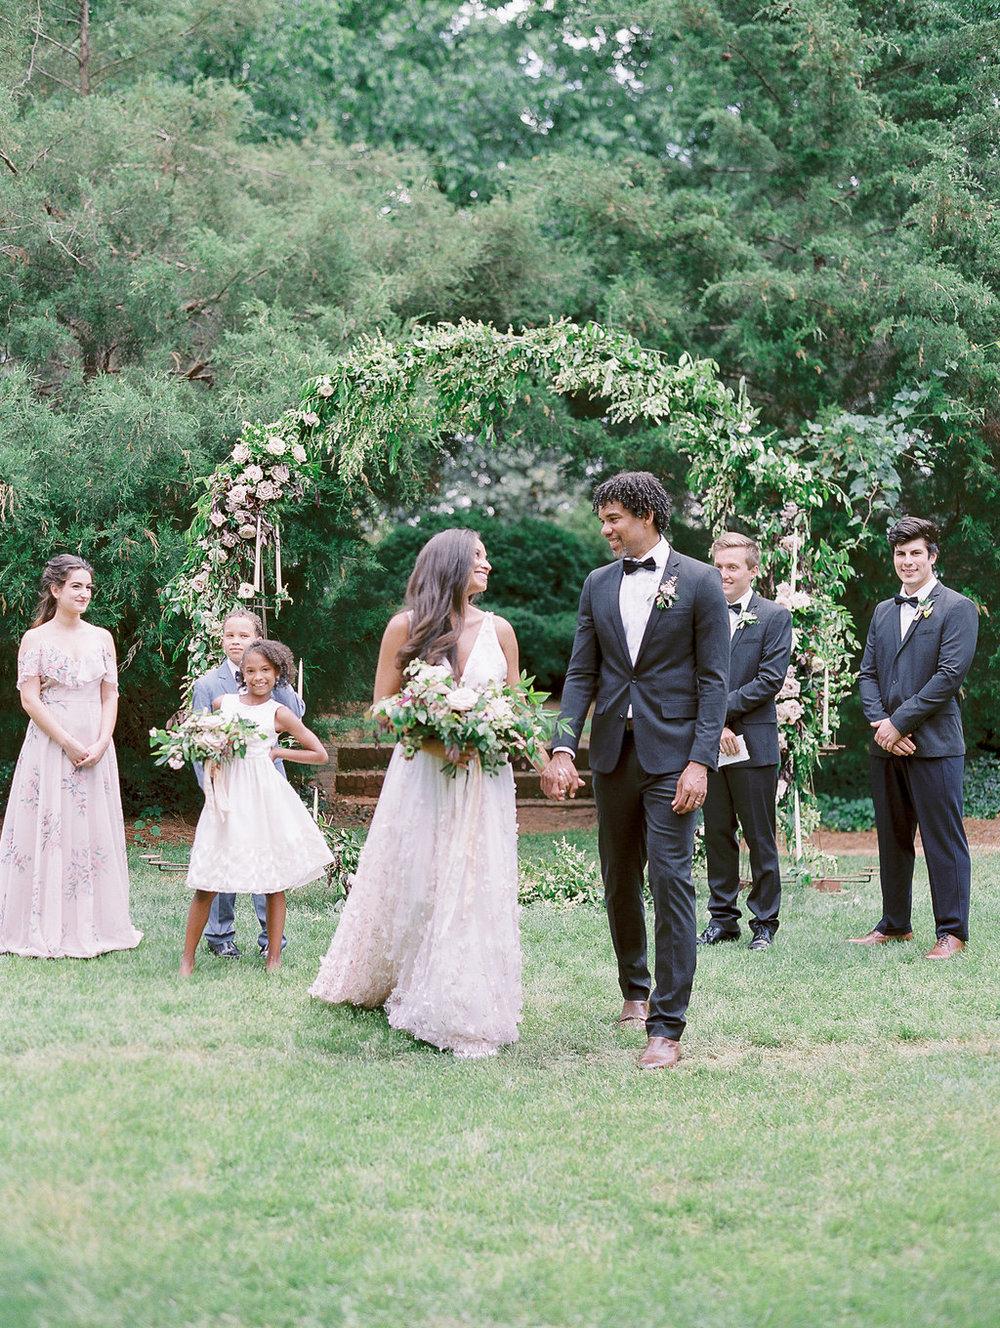 Adoption-editorial-marietta-conference-cetner-wedding-atlanta-wedding-photographer-6.jpg